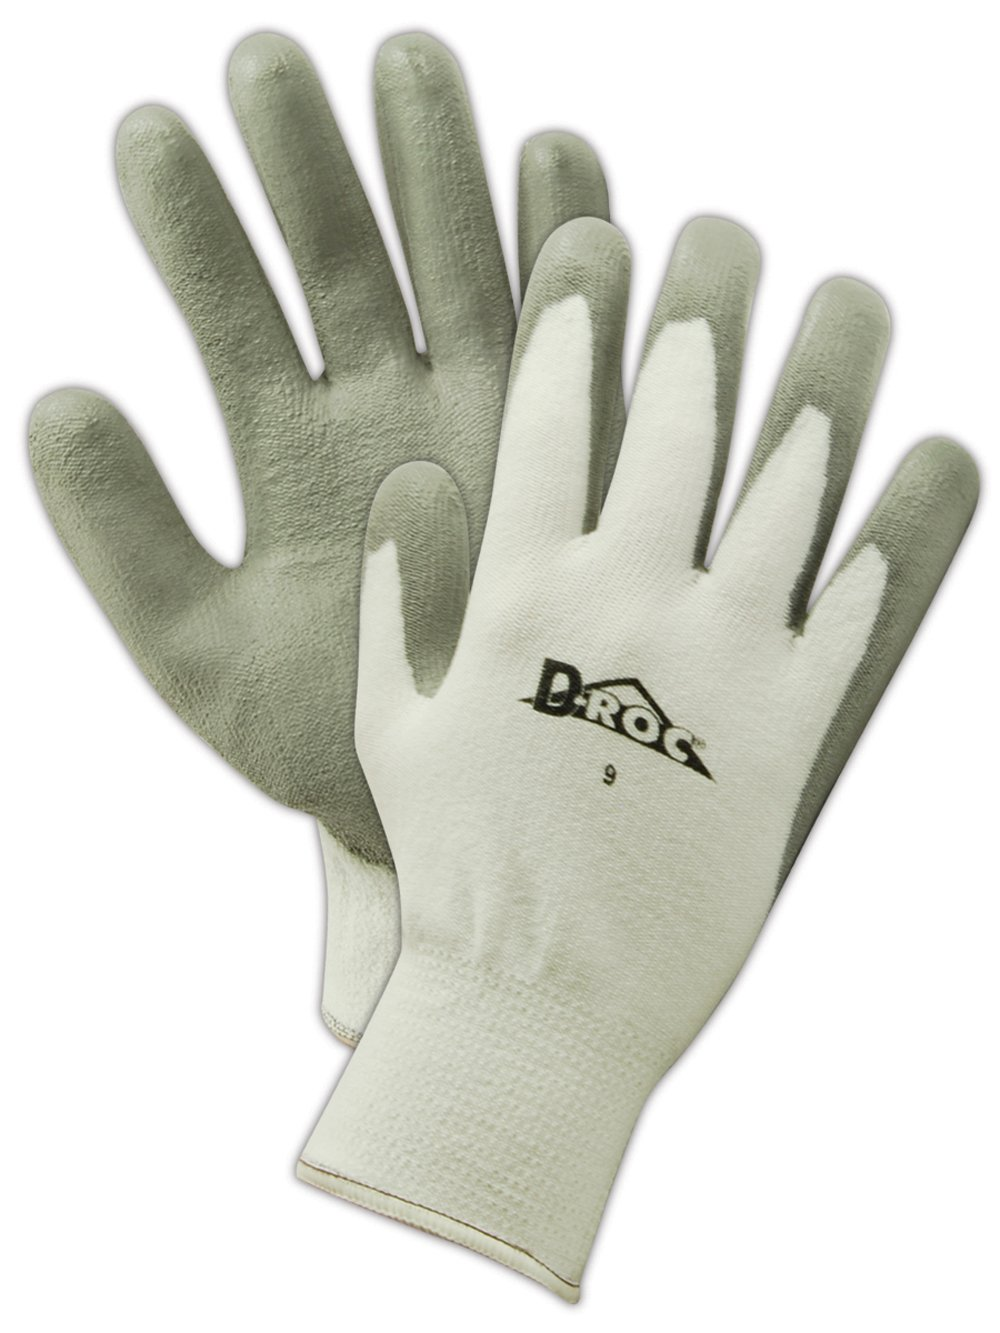 Magid D-ROC GPD570 Polyethylene/Polyester Glove, Gray Polyurethane Palm Coating, Knit Wrist Cuff